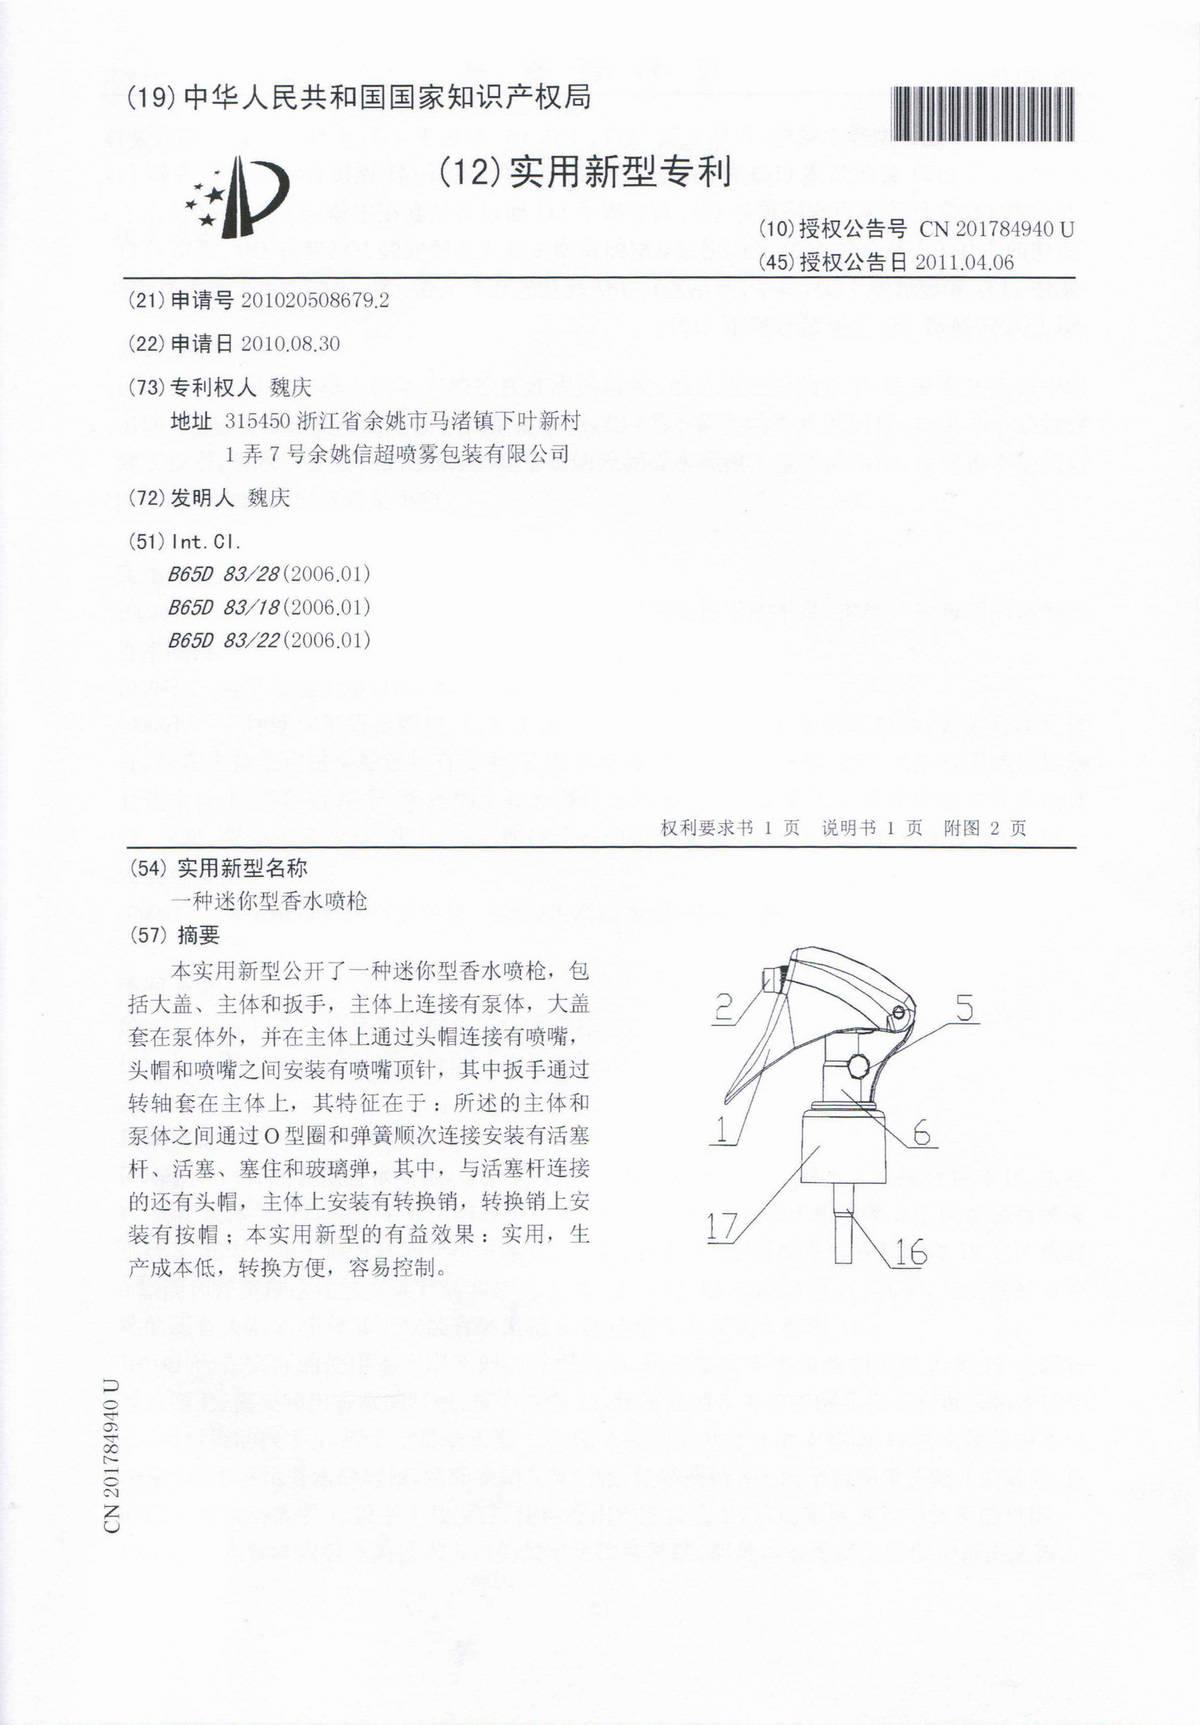 XC01-2 Patent